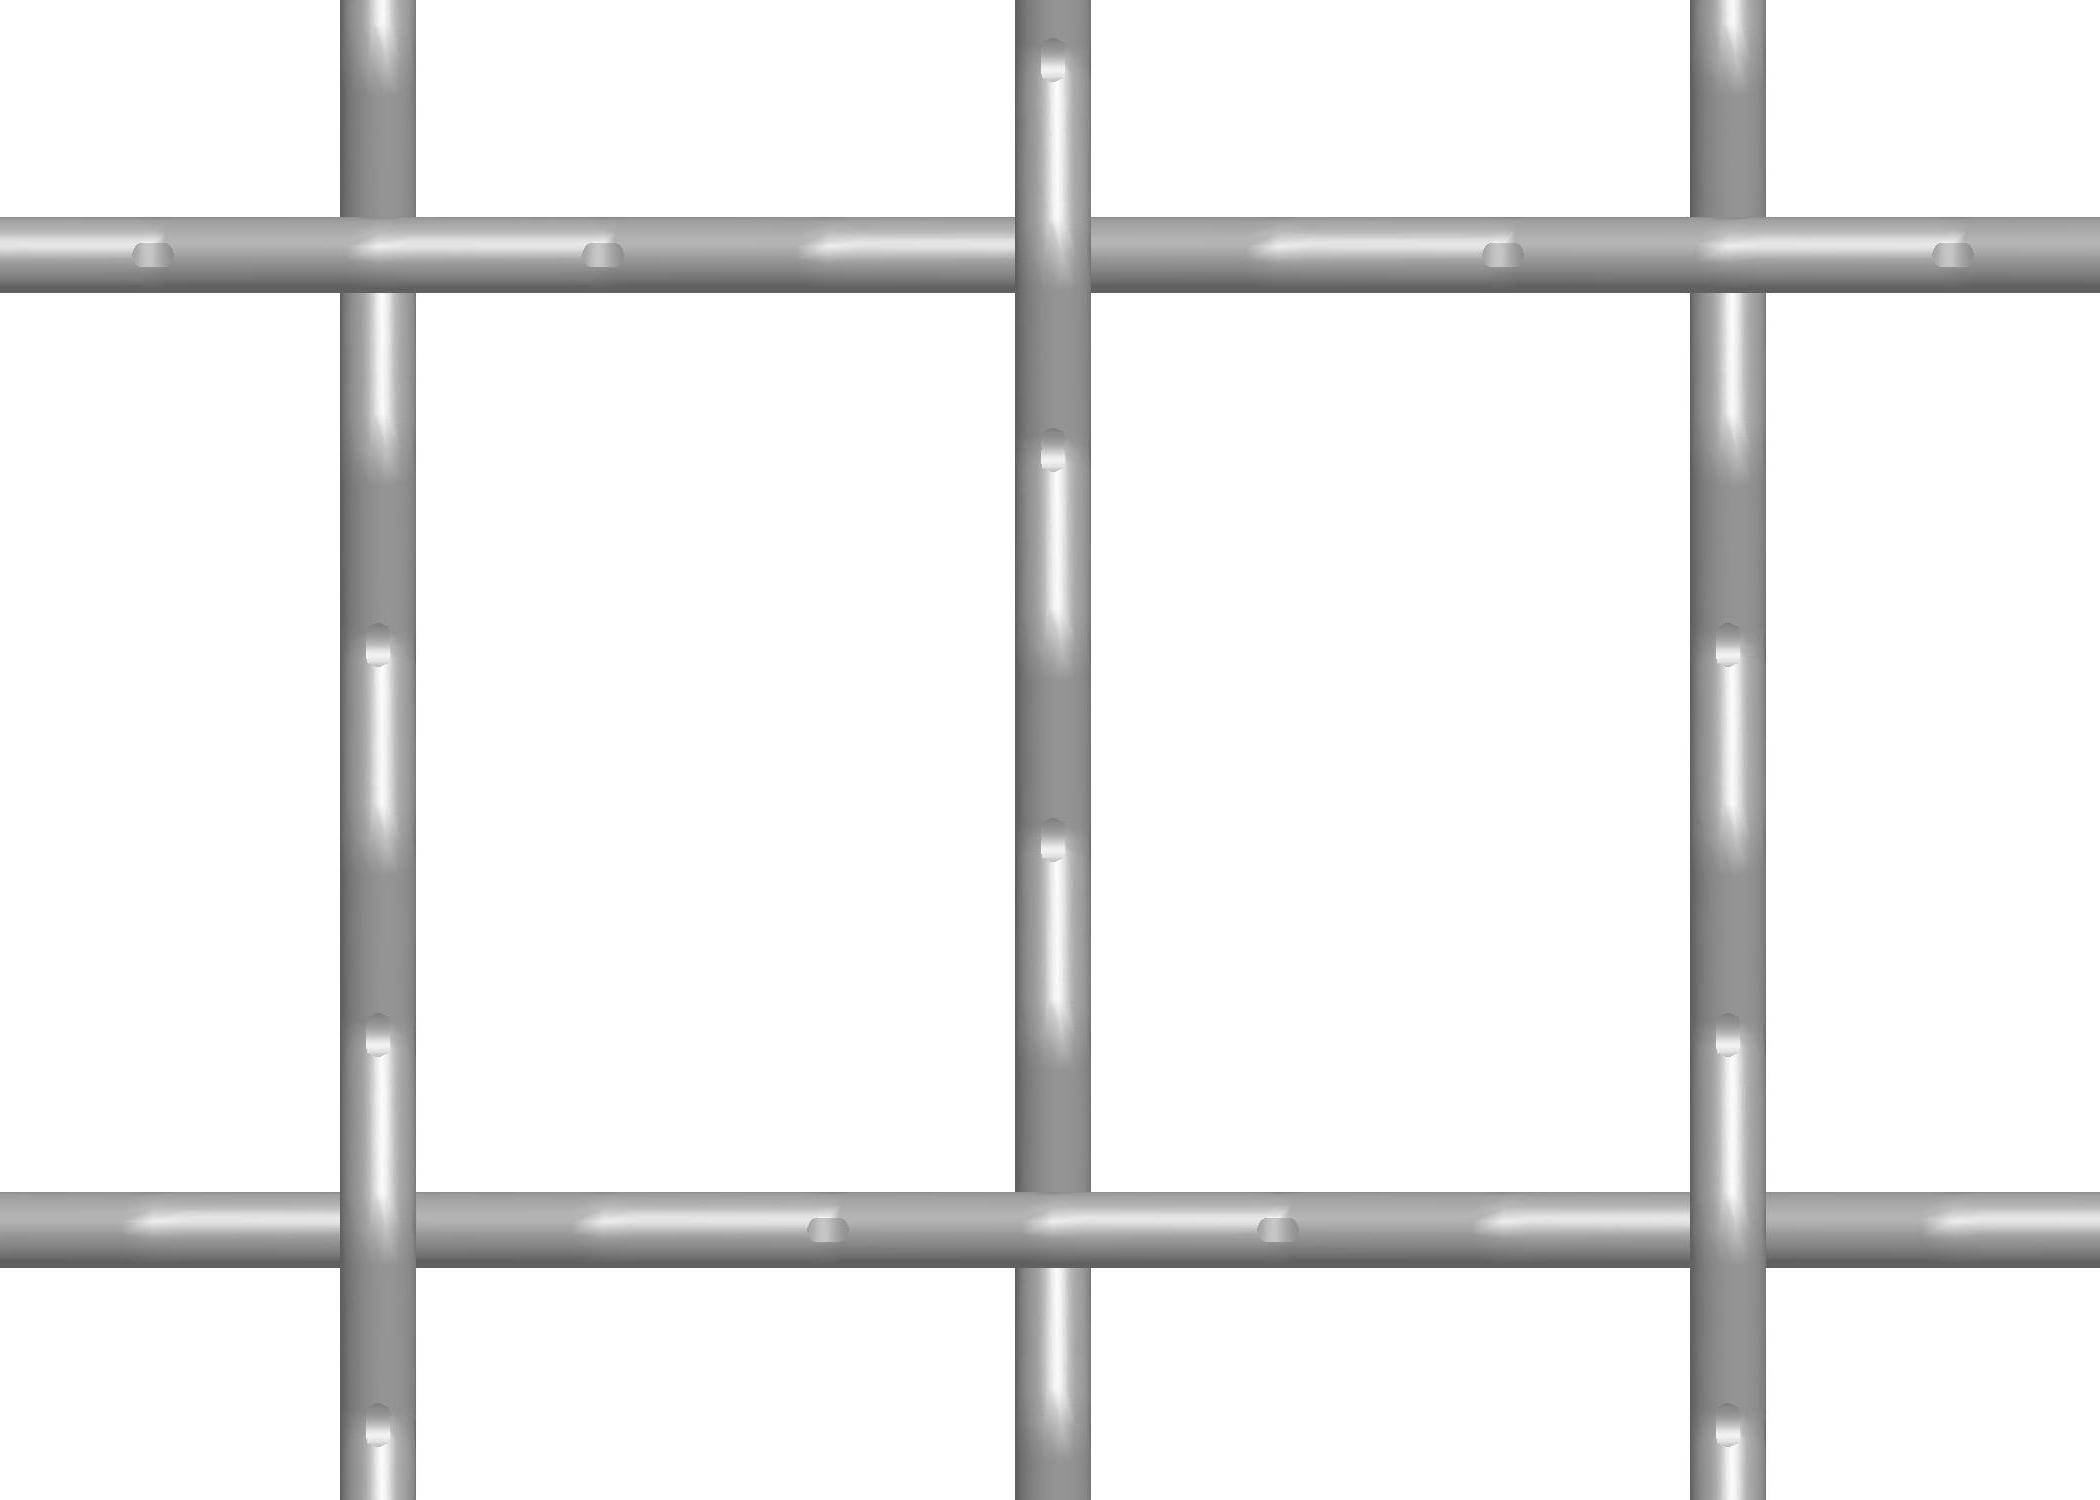 print ready image for IZ-46